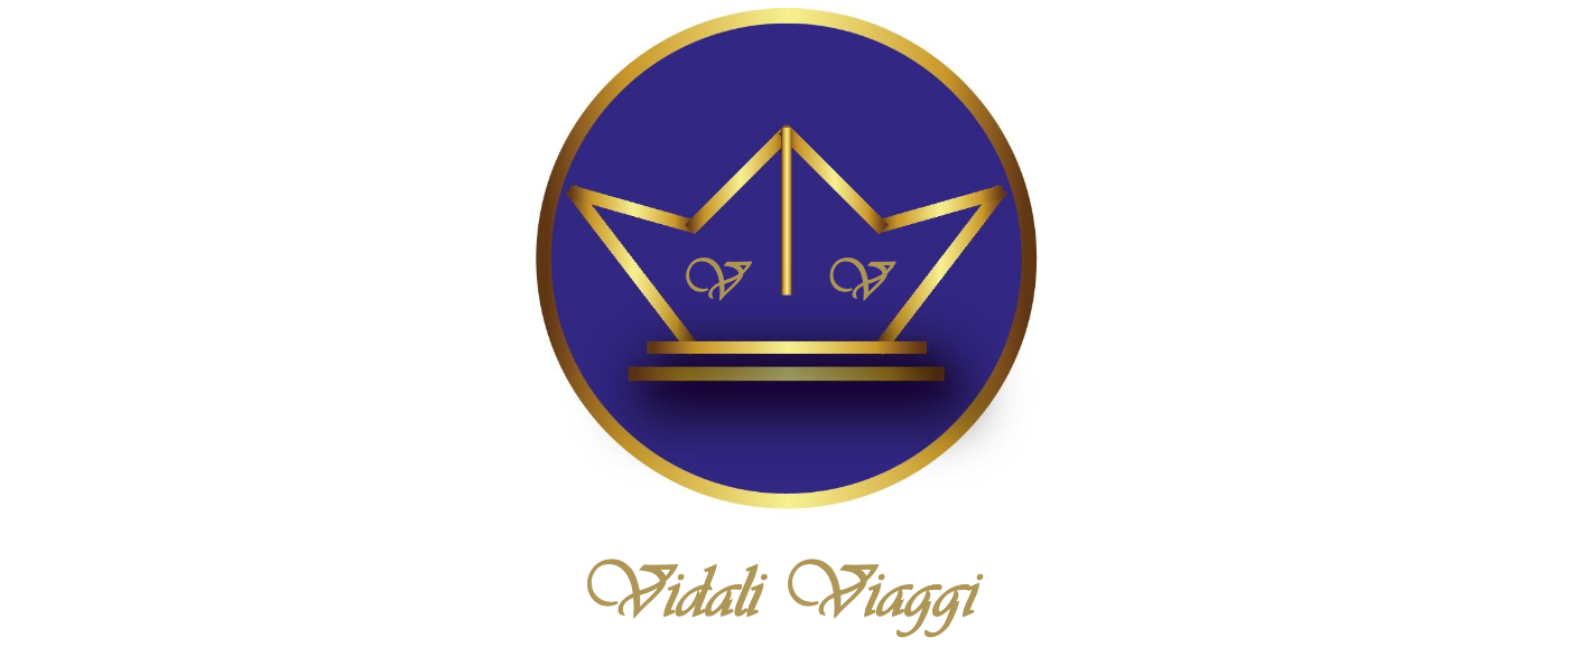 lew logo 2.png